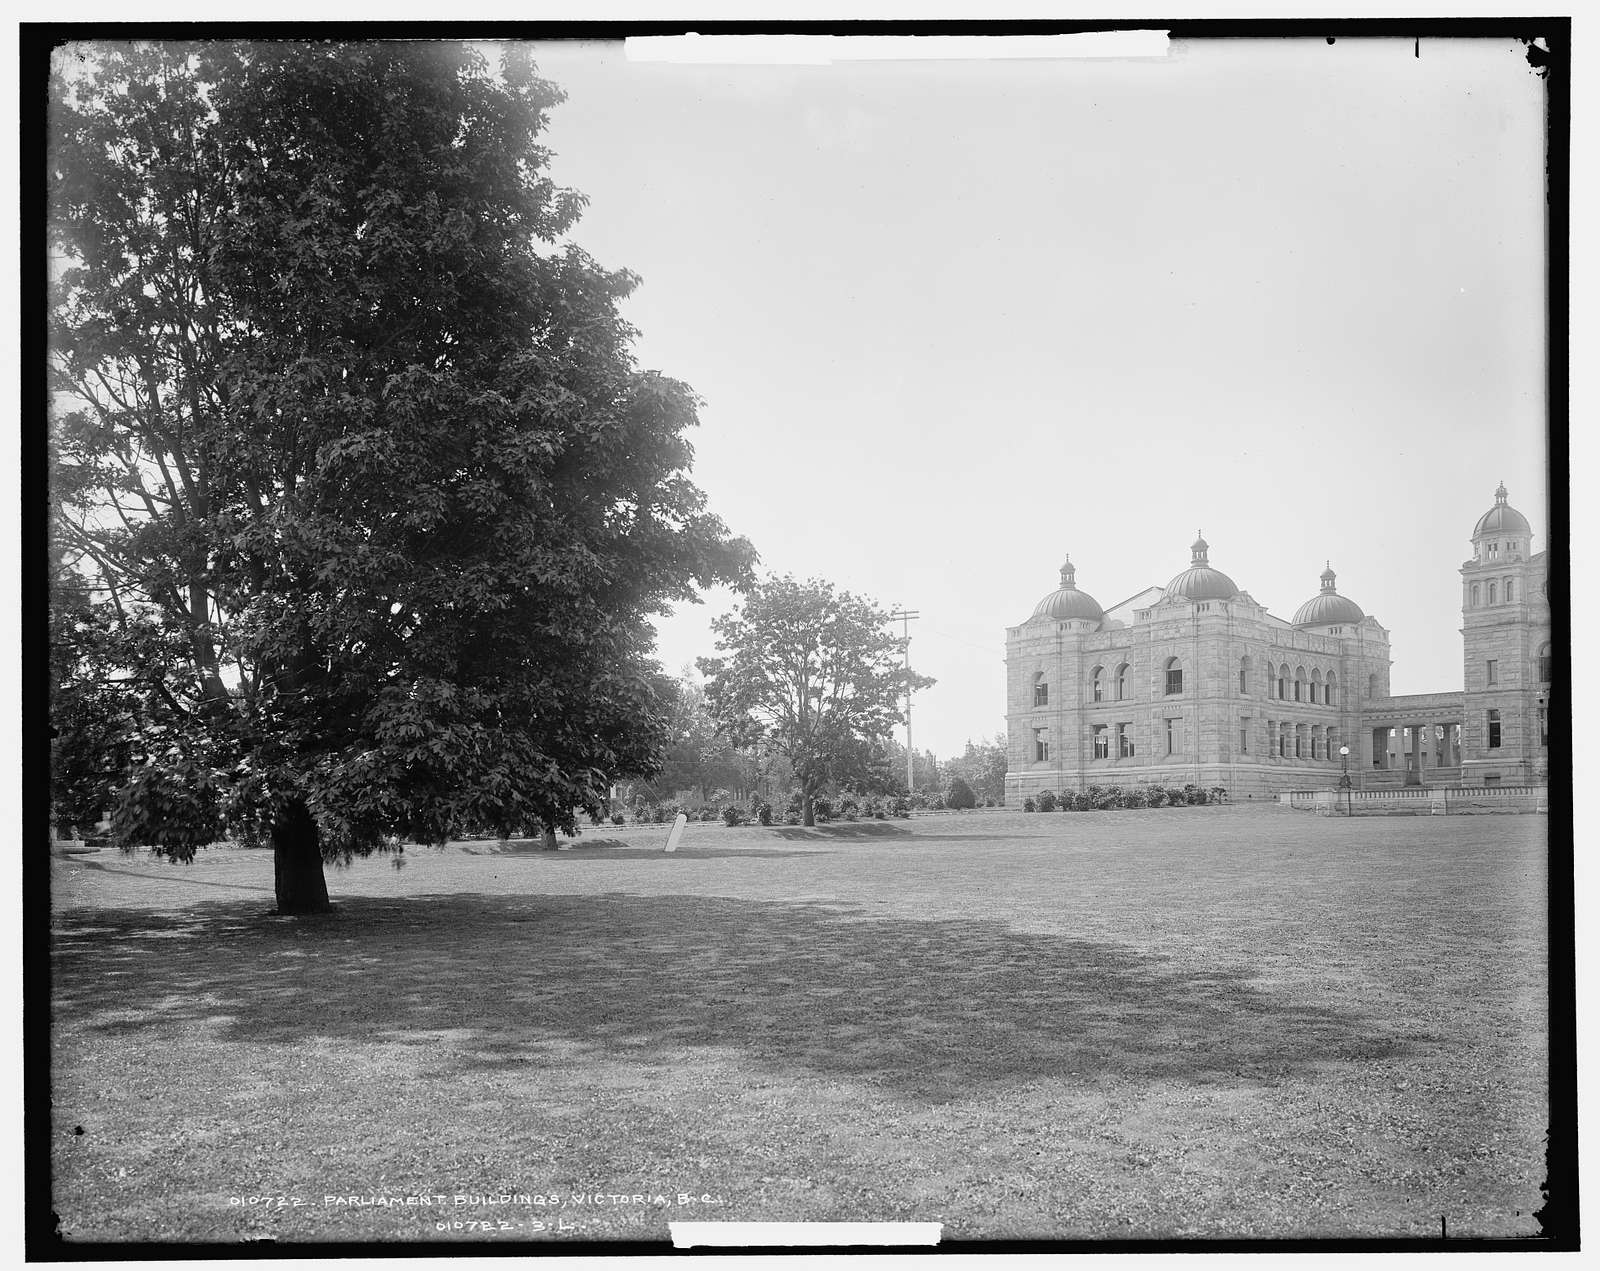 Parliament buildings, Victoria, B.C